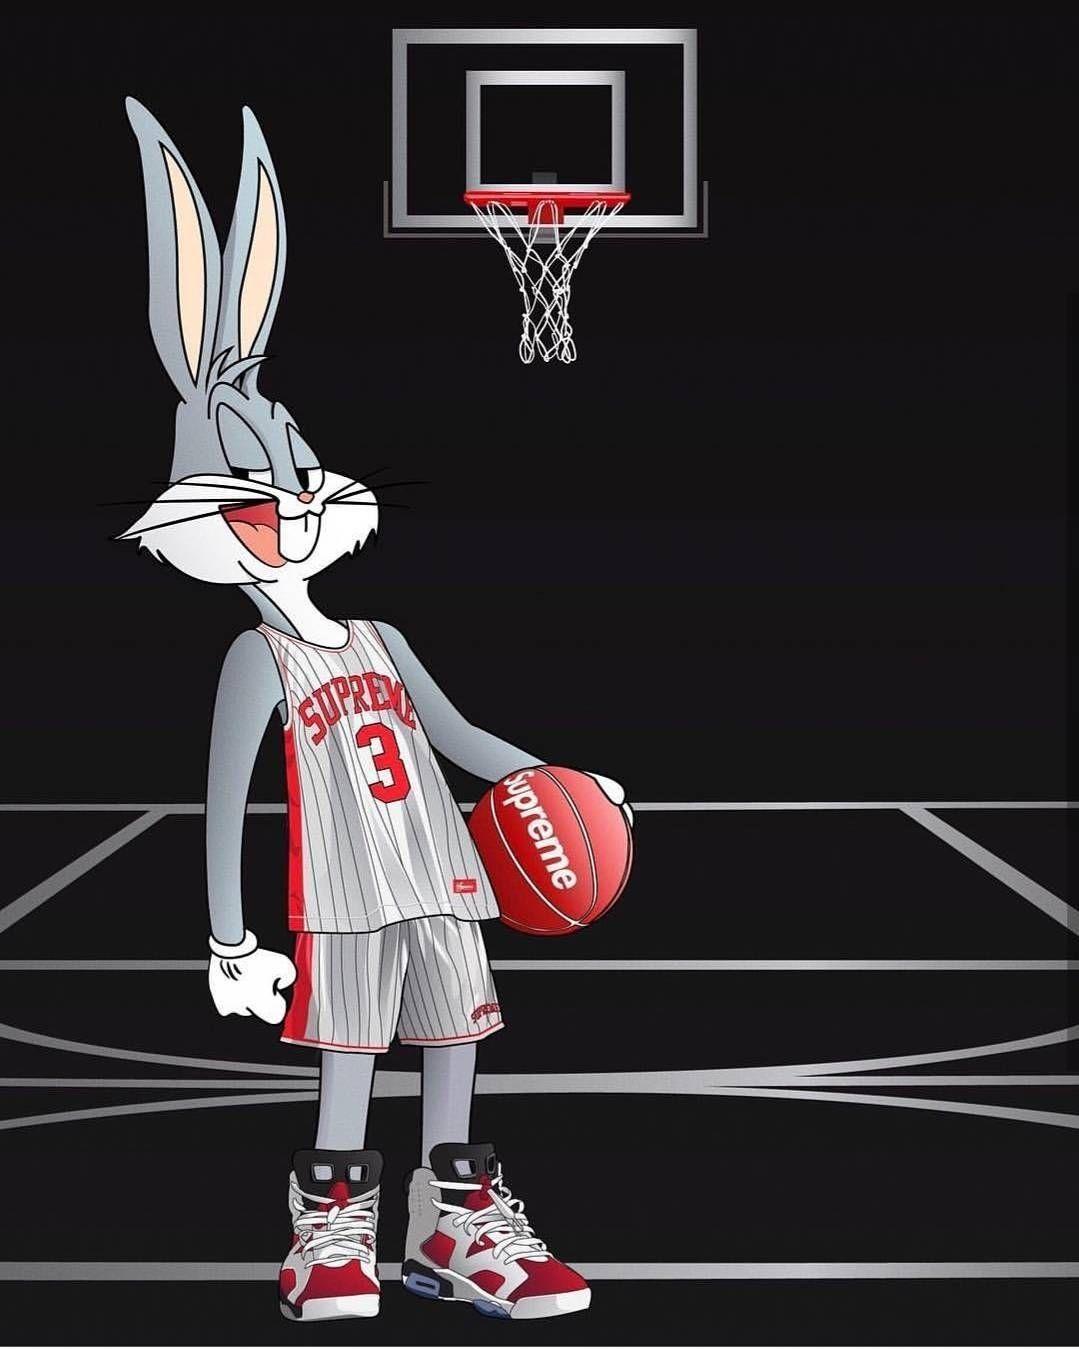 Animated Nba Wallpaper Http Wallpapersalbum Com Animated Nba Wallpaper Html In 2020 Cute Cartoon Wallpapers Supreme Wallpaper Bunny Wallpaper